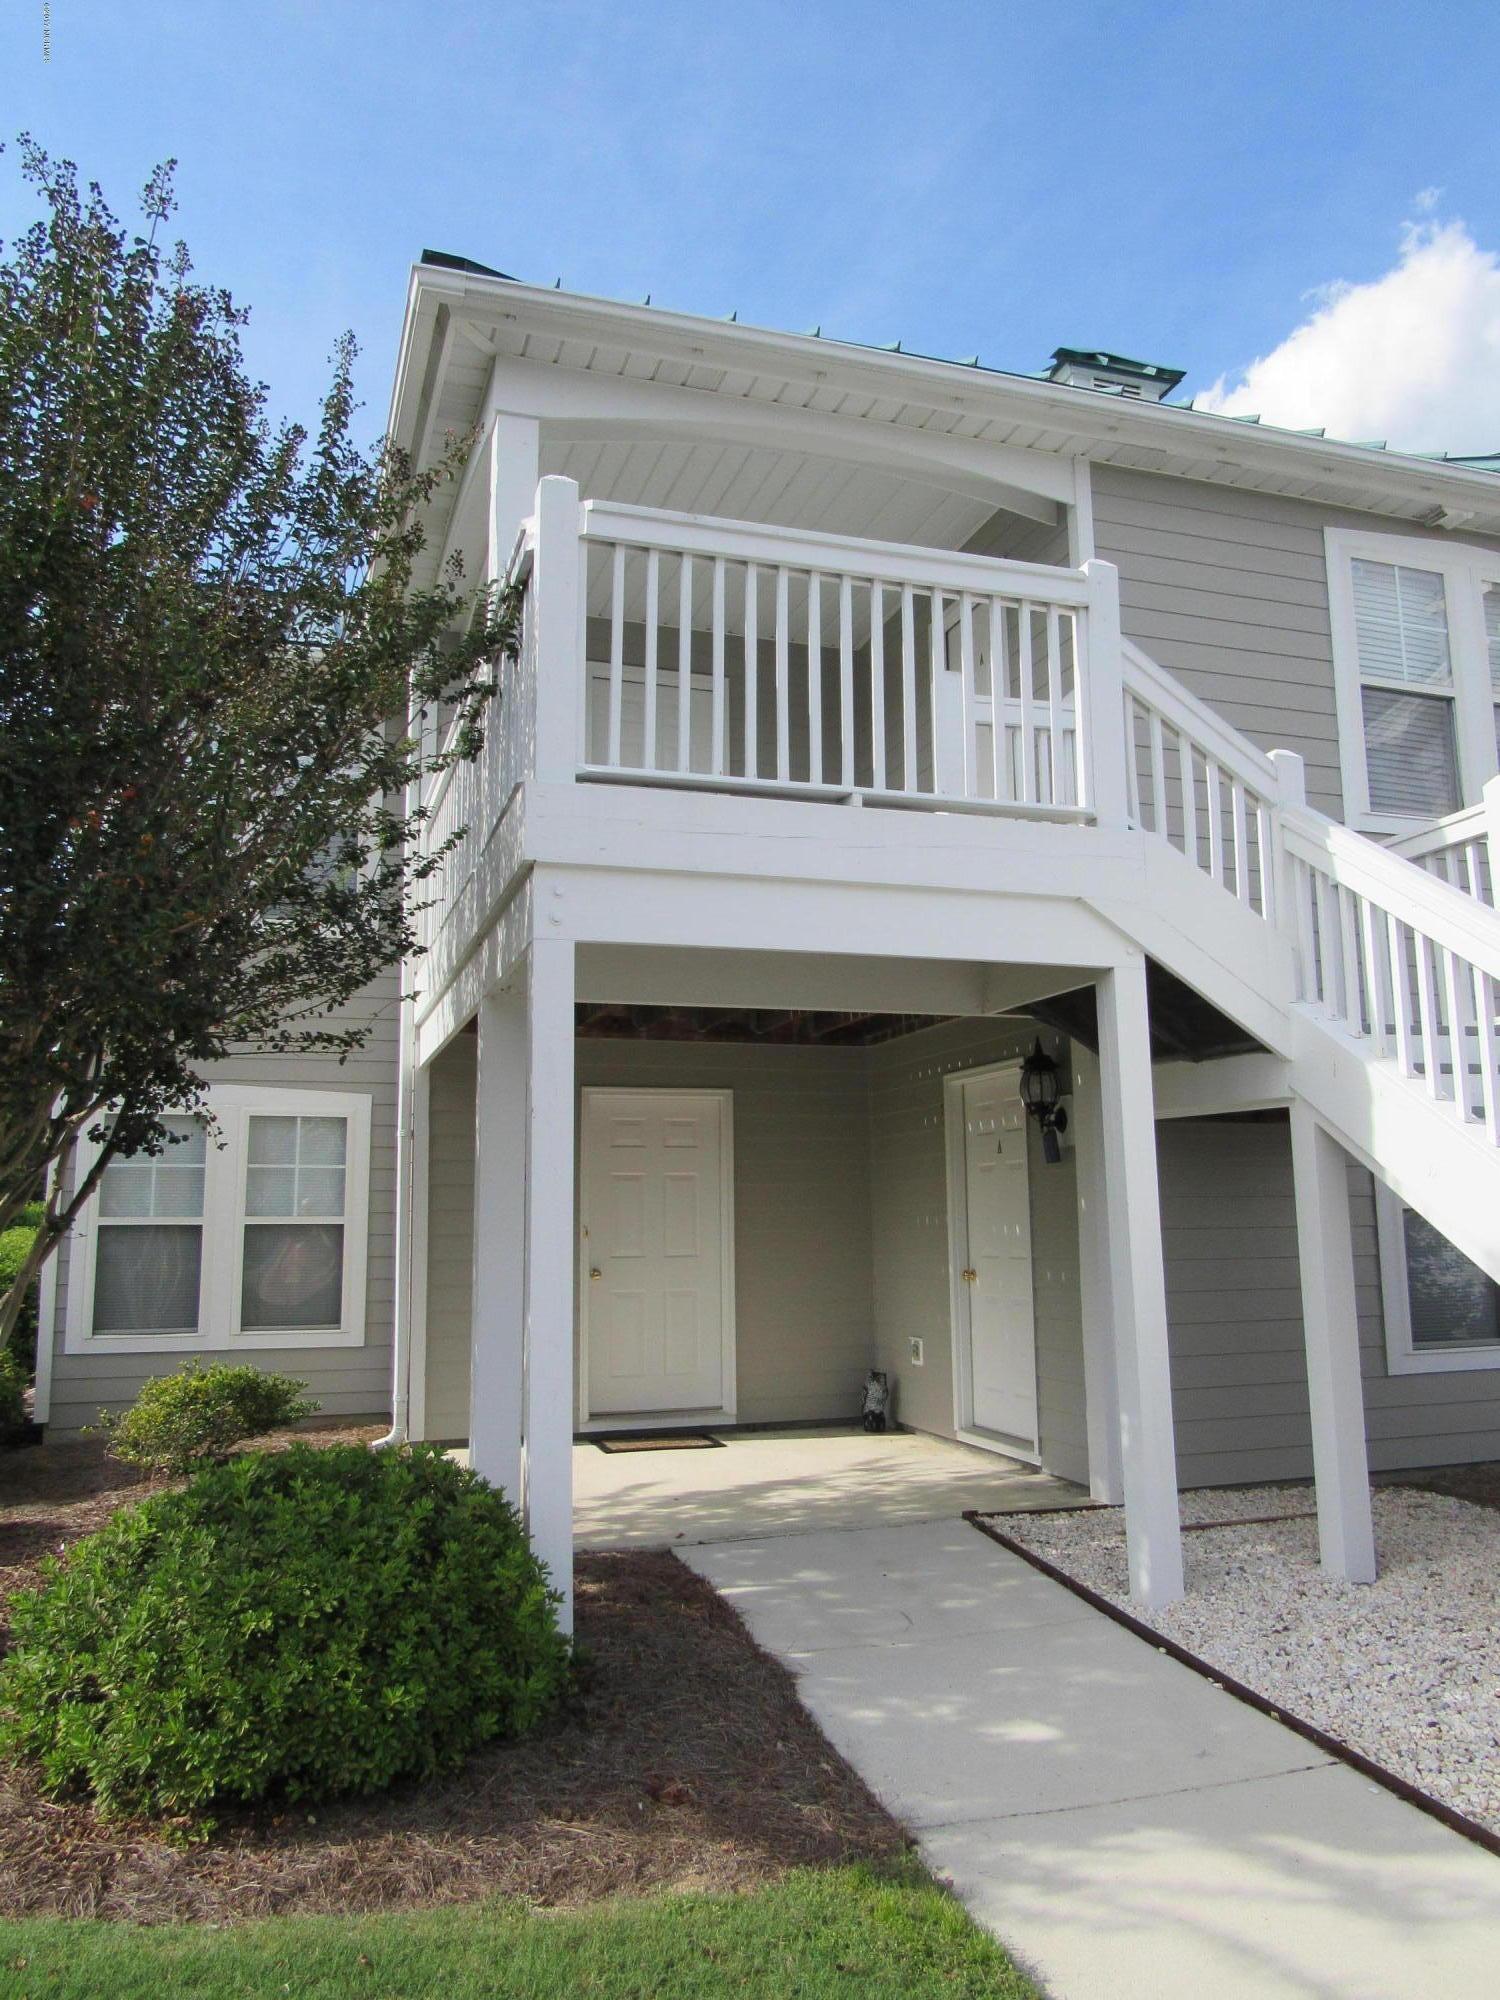 Carolina Plantations Real Estate - MLS Number: 100155883